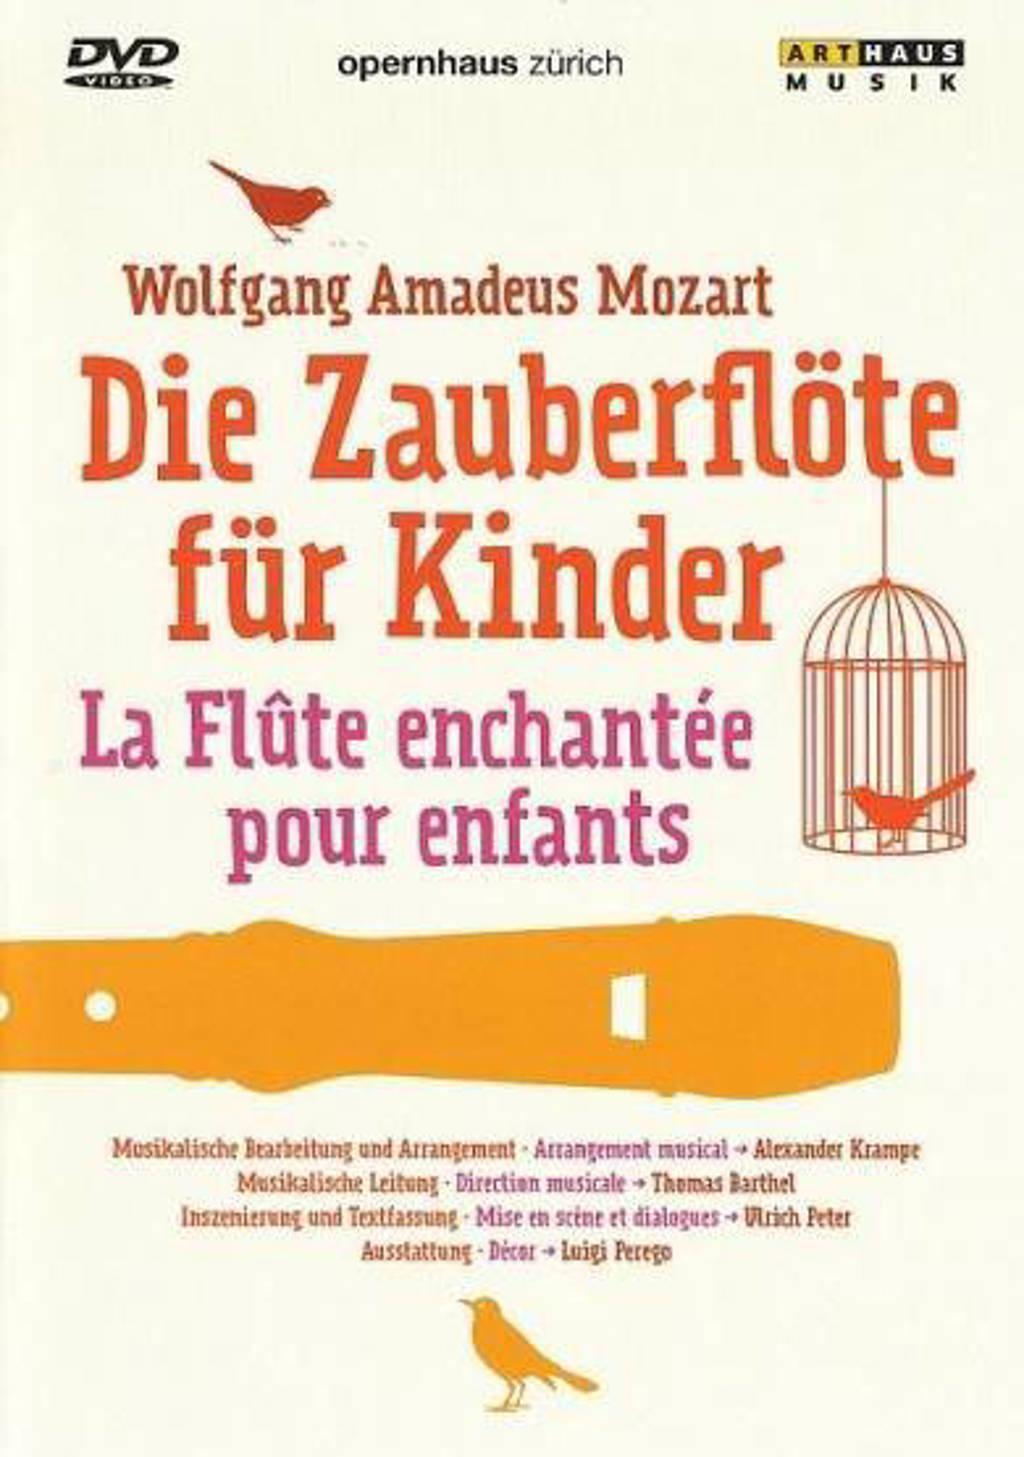 Drole,Rabl,Kyriakidou,Guo,Bidzinski - Die Zauberflote Fur Kinder, Zurich (DVD)